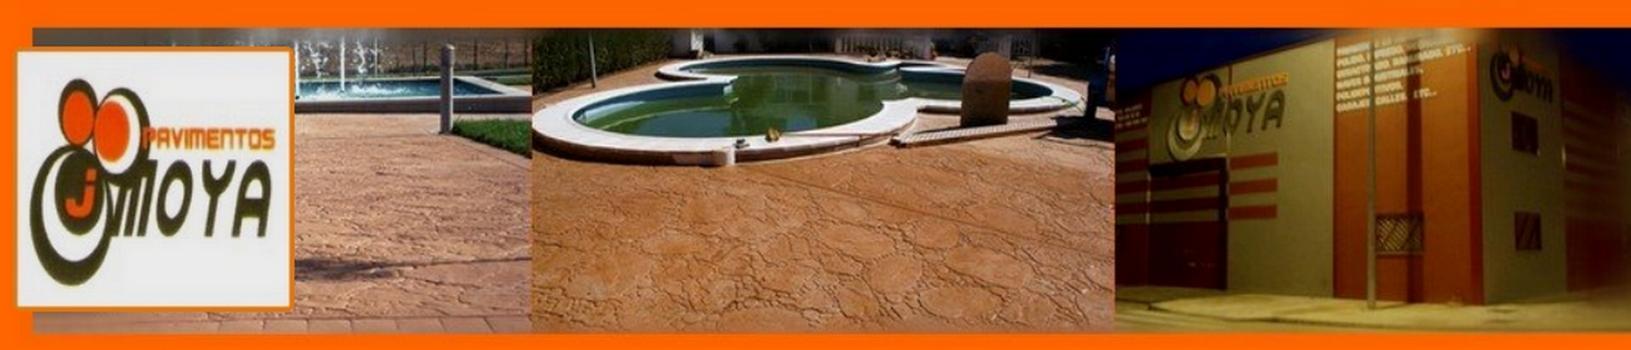 Pavimentos moya , pavimentos en Extremadura , pavimentos en badajoz , pavimentos en caceres